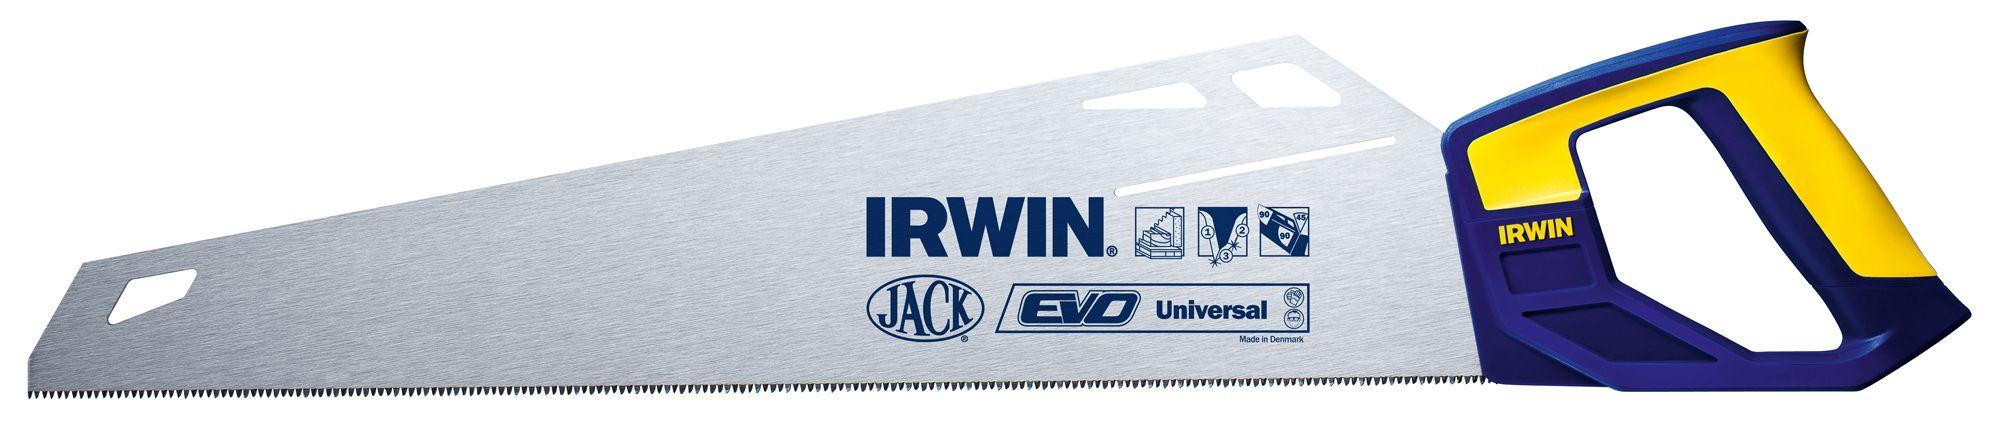 Irwin Steel (c75) Panel Saw (l)425mm